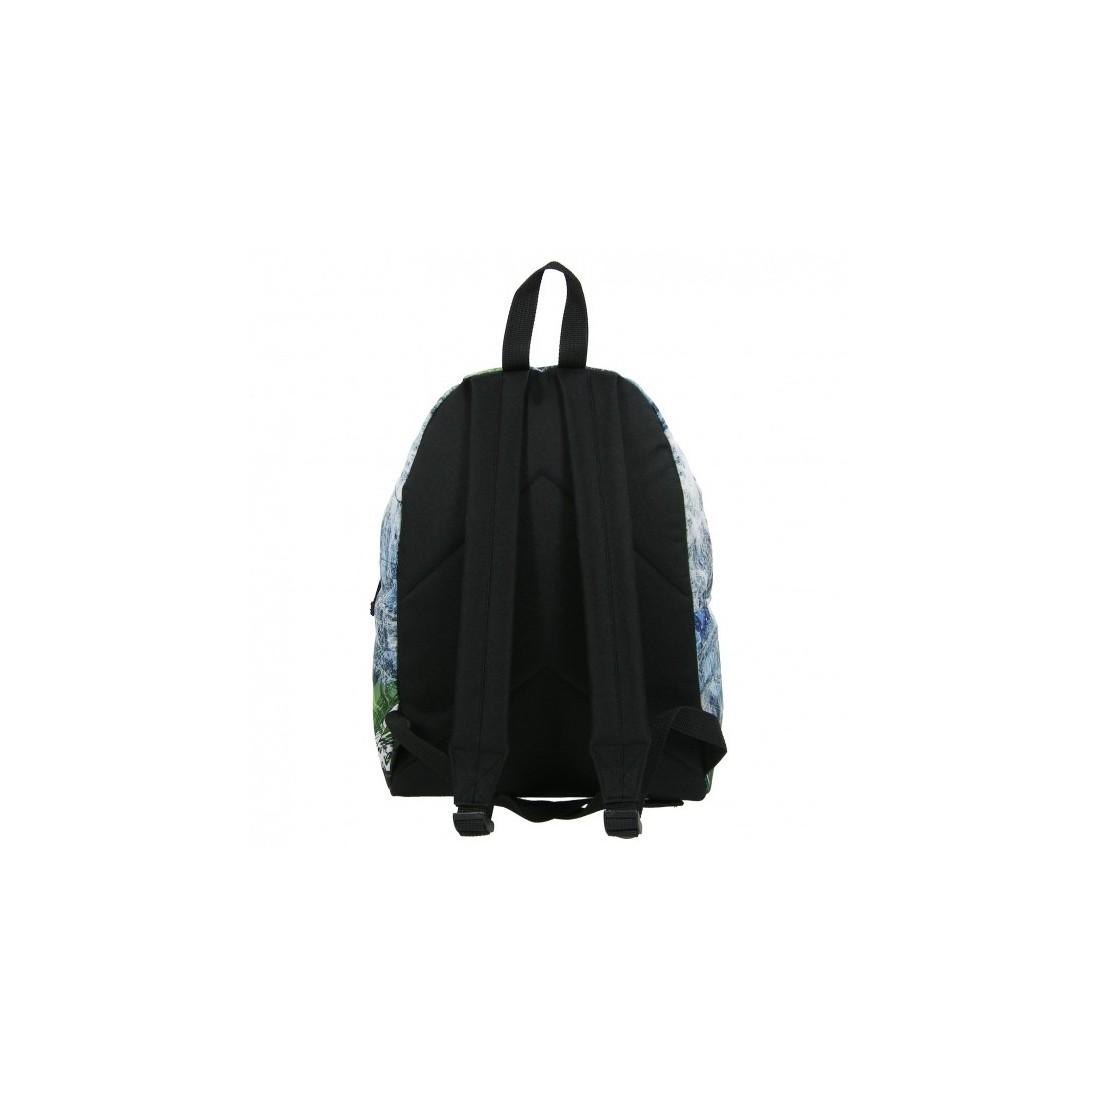 Plecak młodzieżowy Fullprint Scratch - plecak-tornister.pl